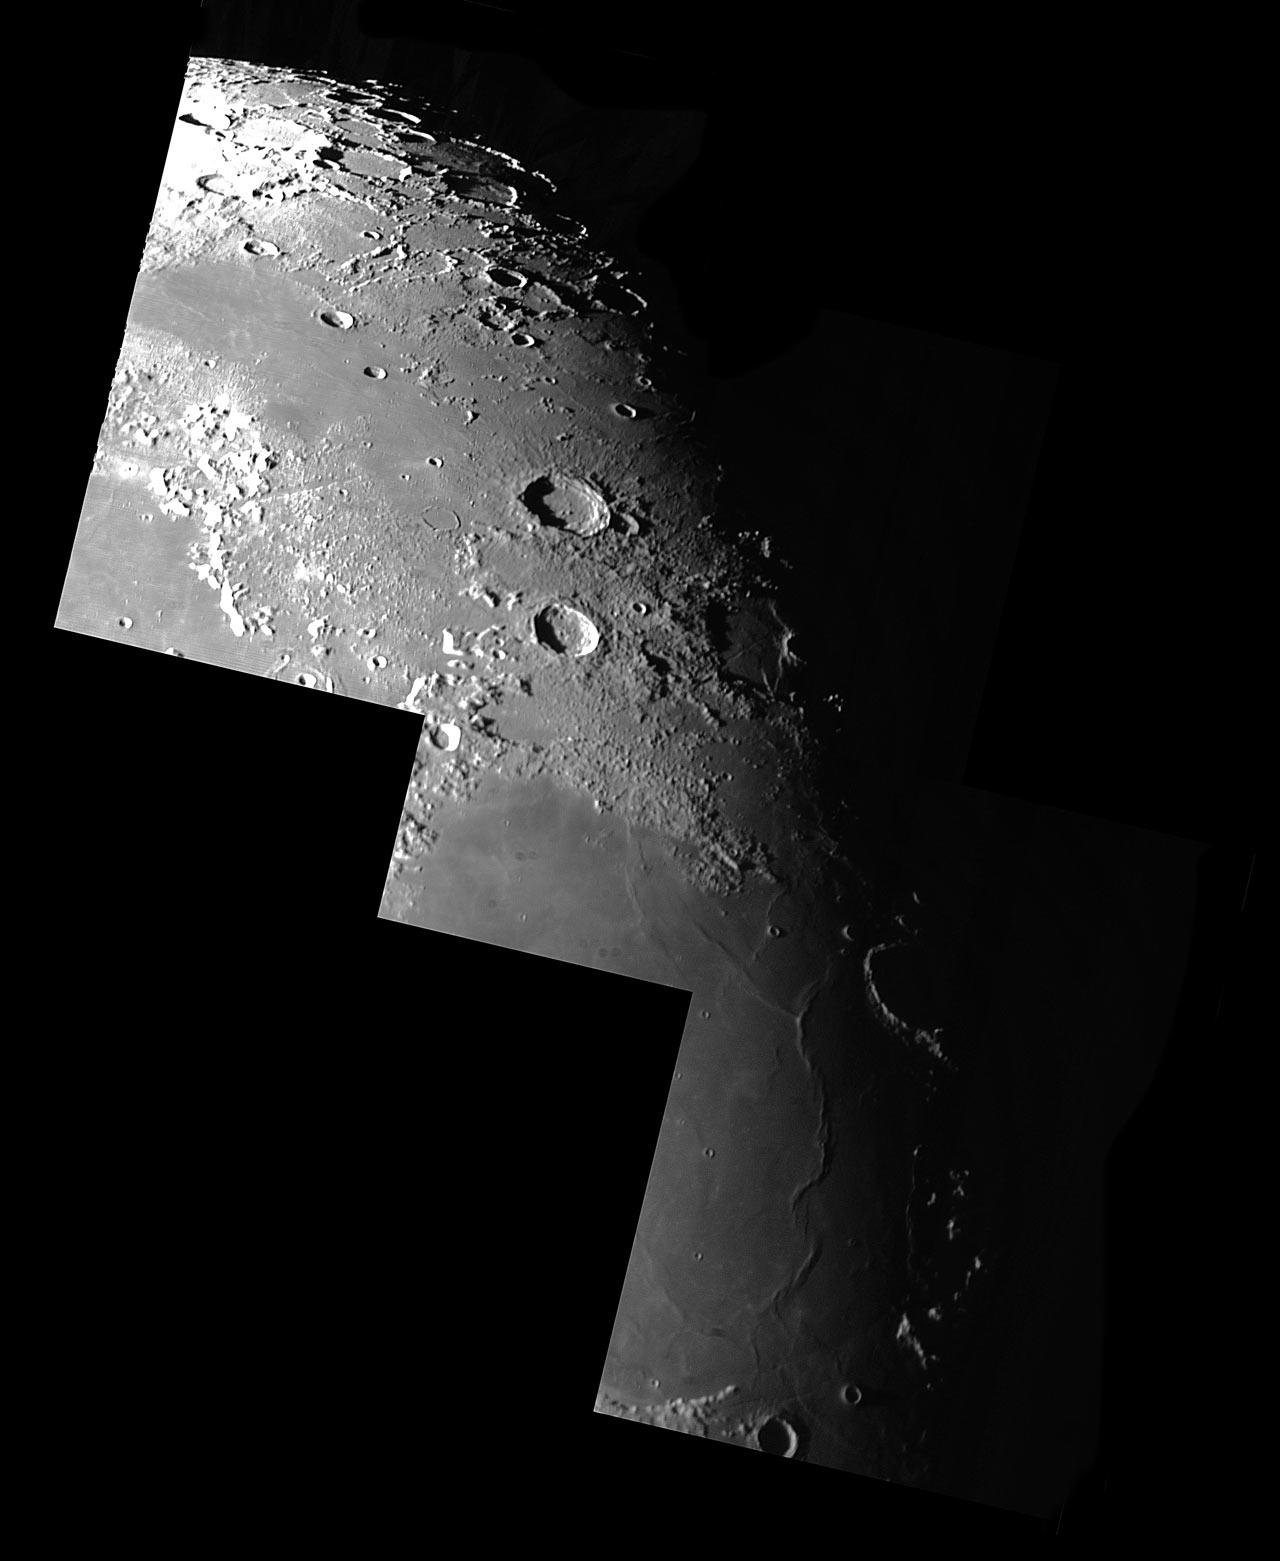 Moon_compliation-v1-small